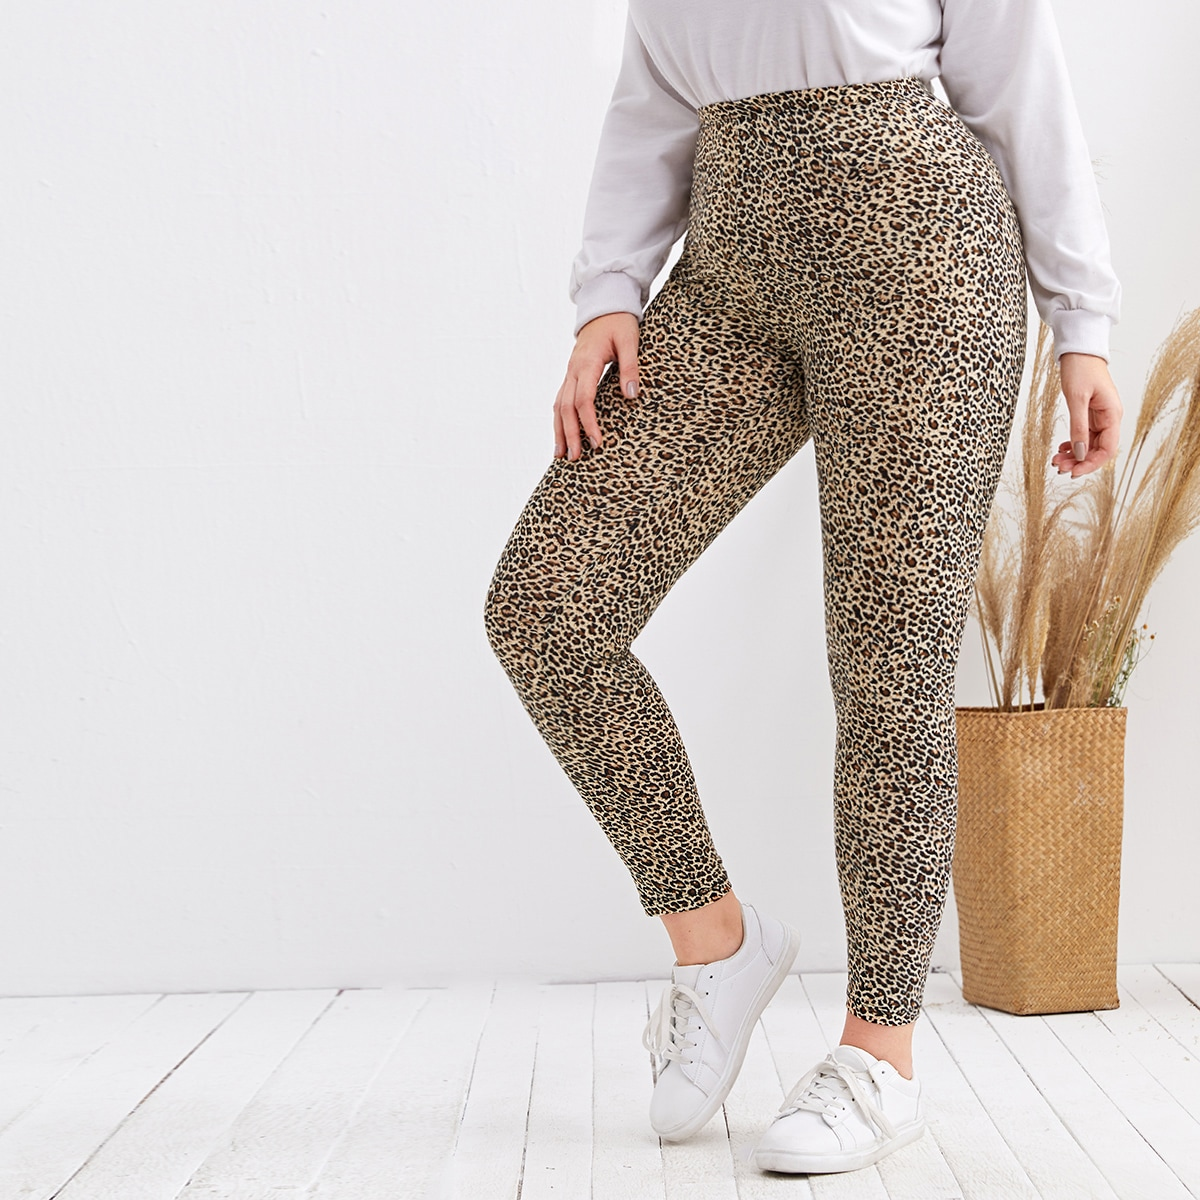 SHEIN Casual Luipaard Grote maat: legging